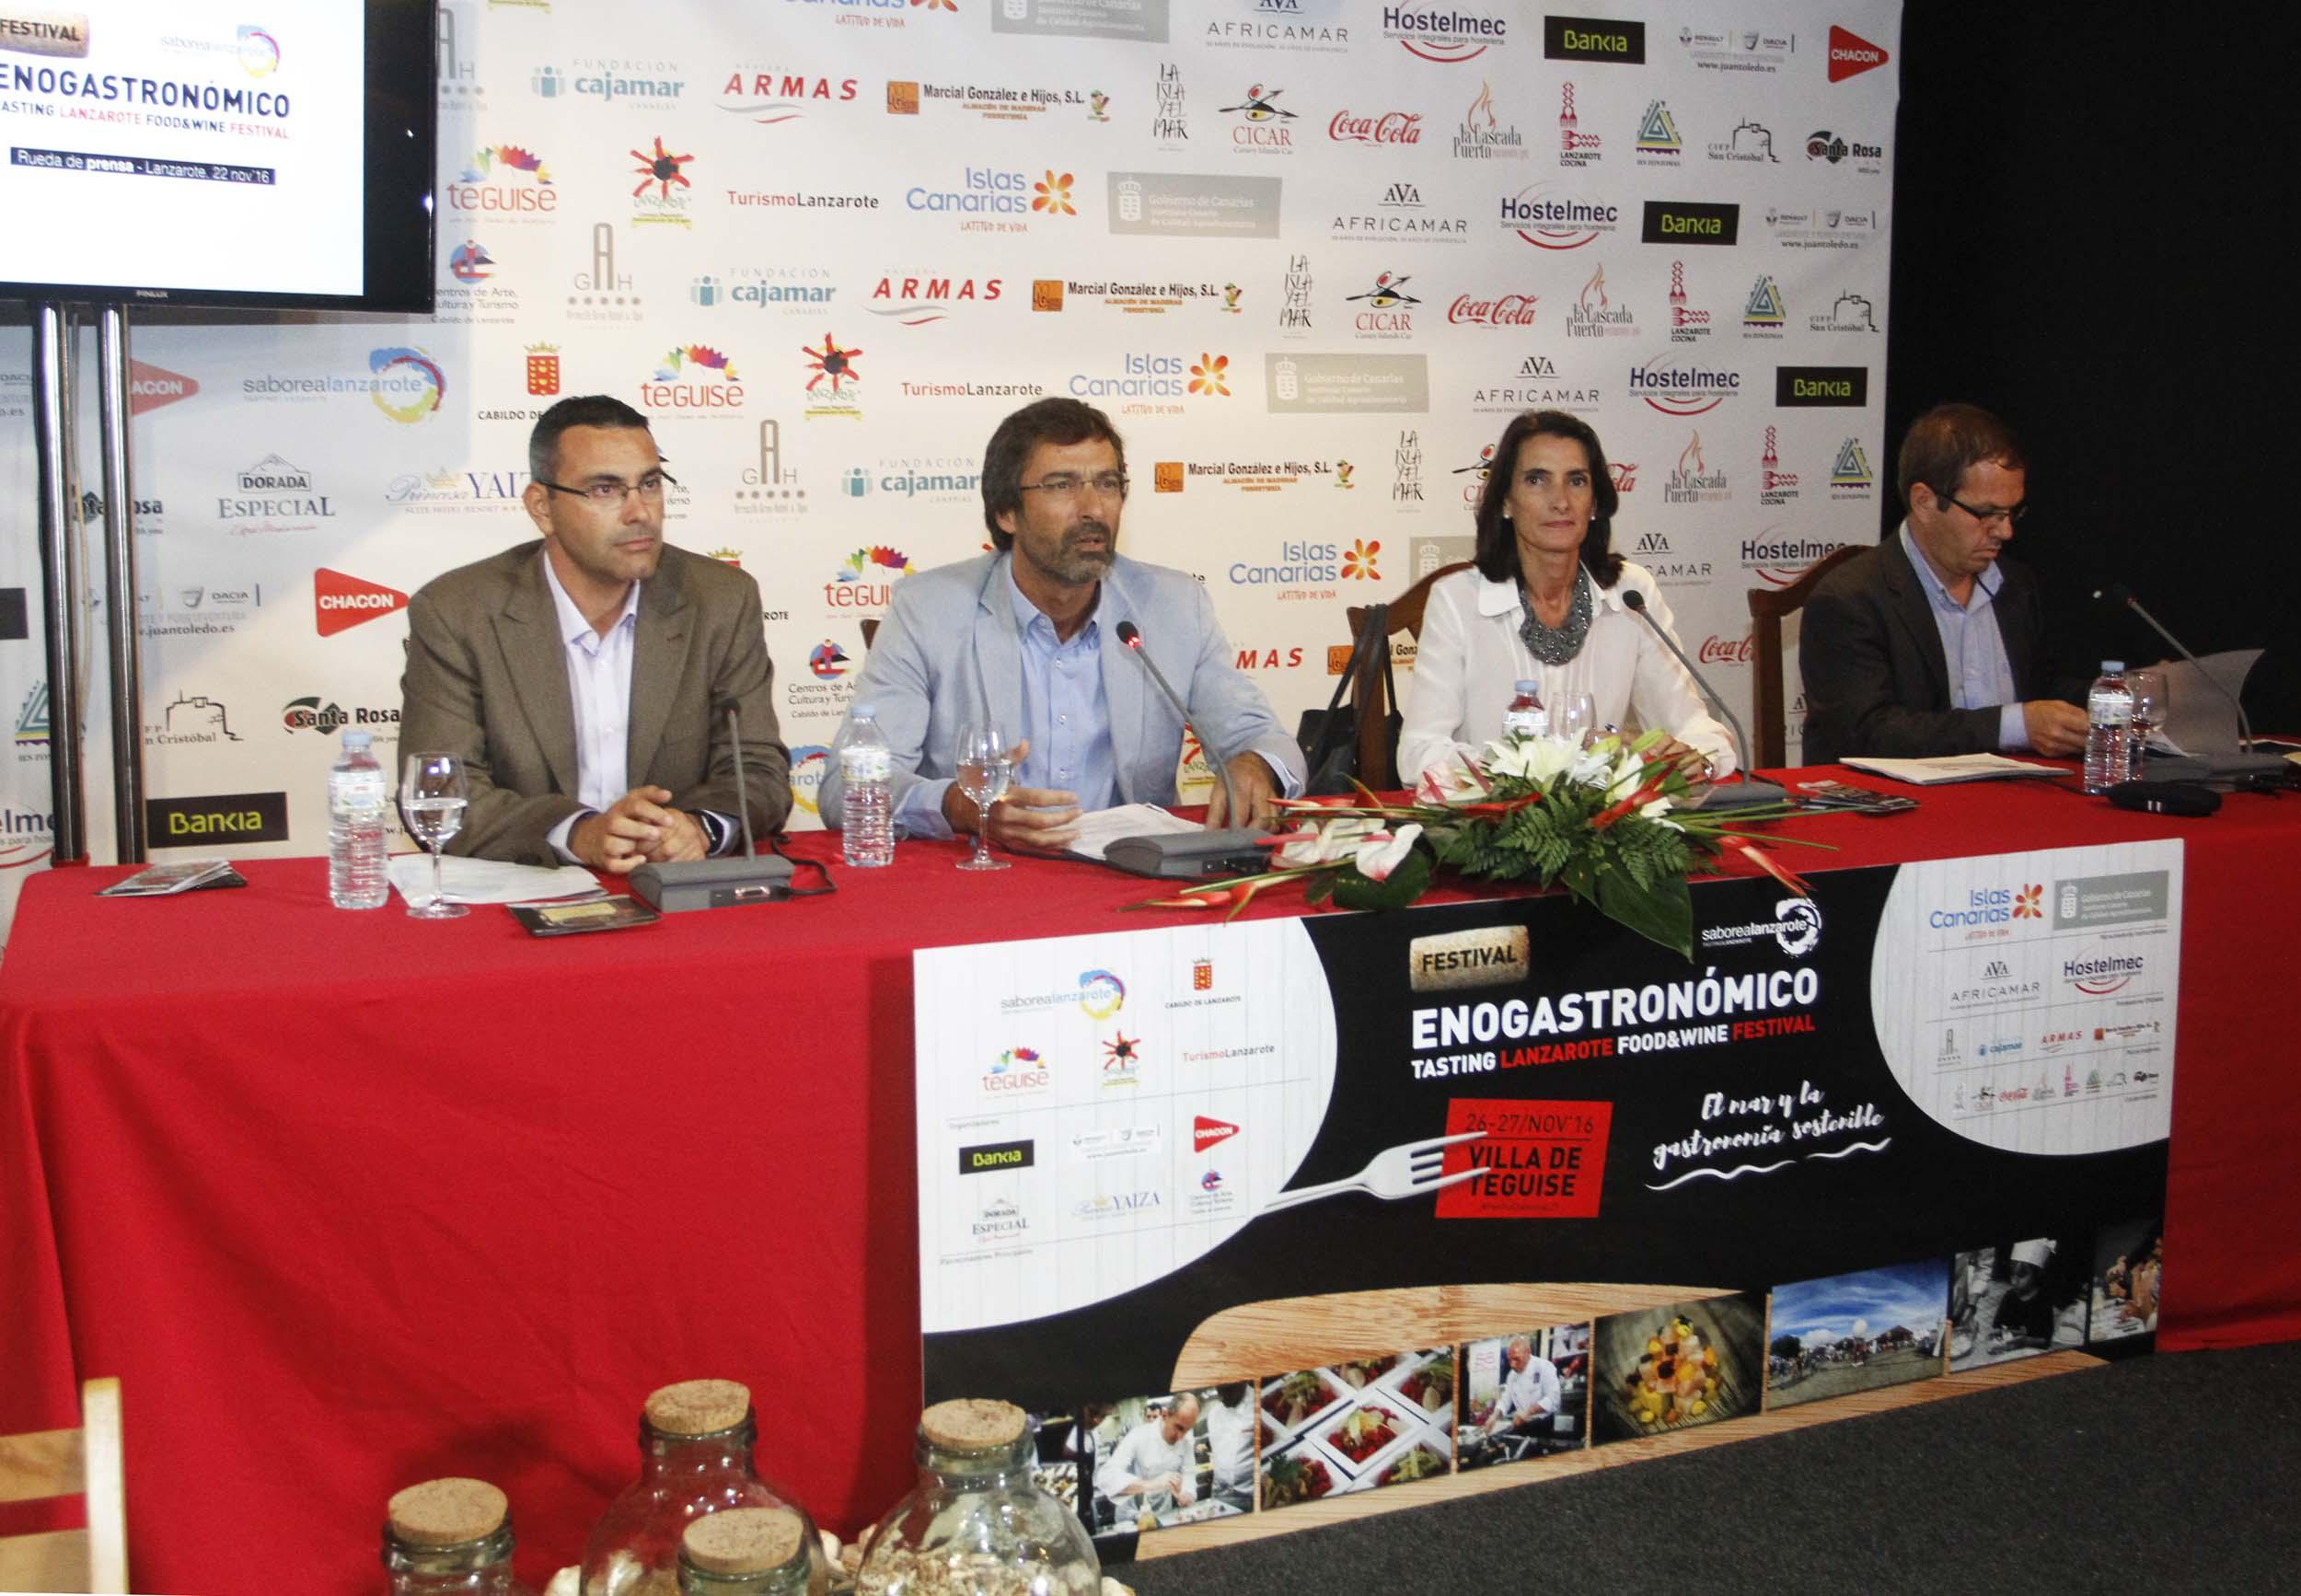 Feria enogastronómica Teguise 2016 presentacion